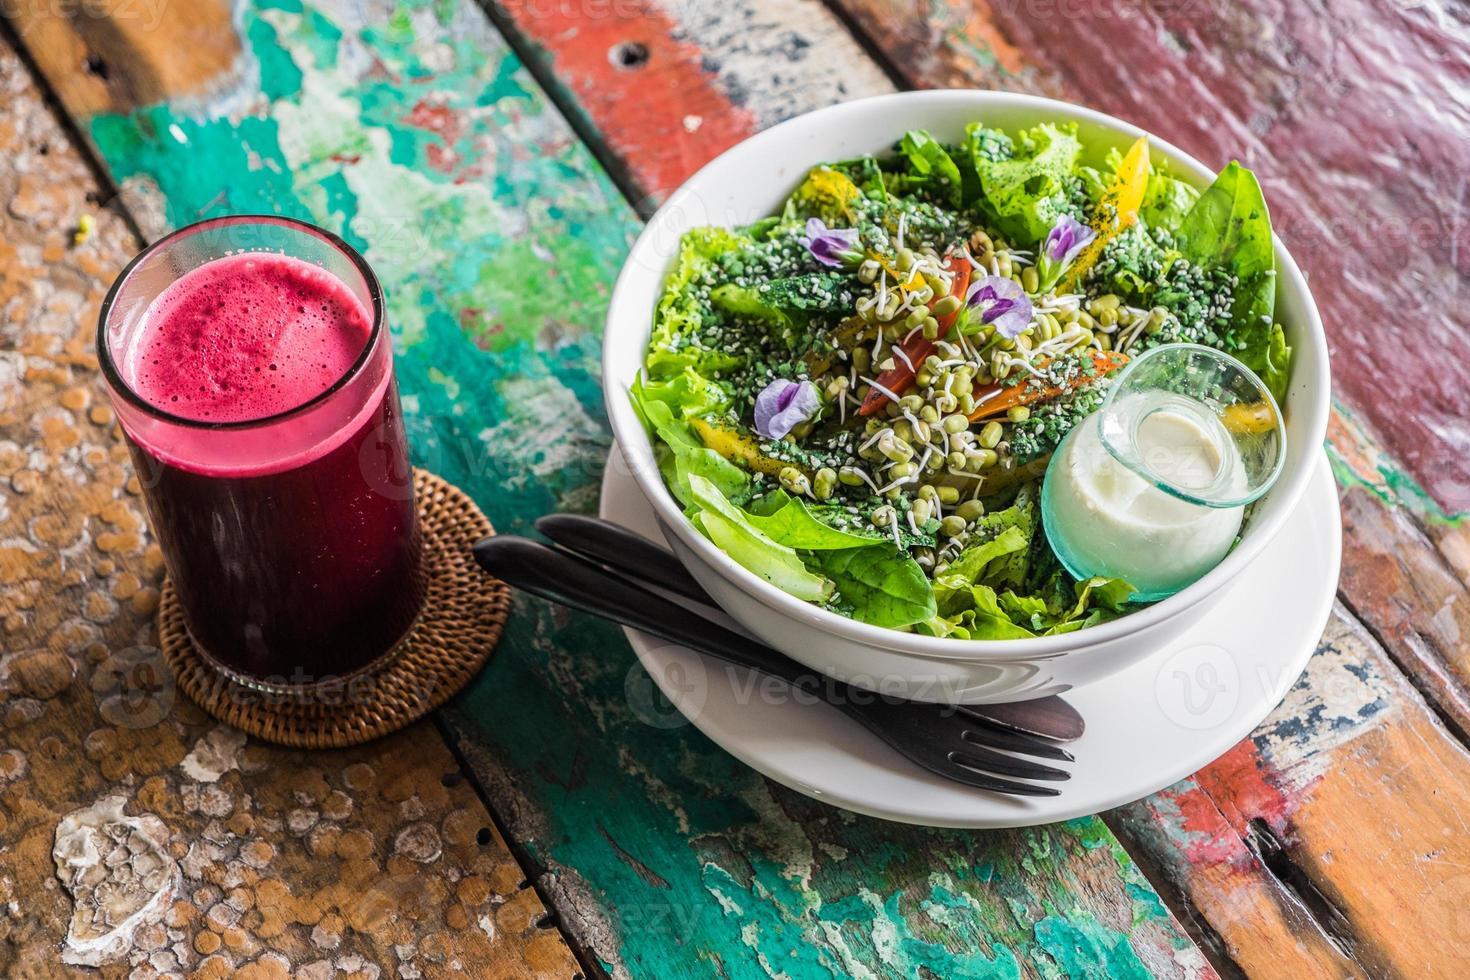 Rainbow salad photo